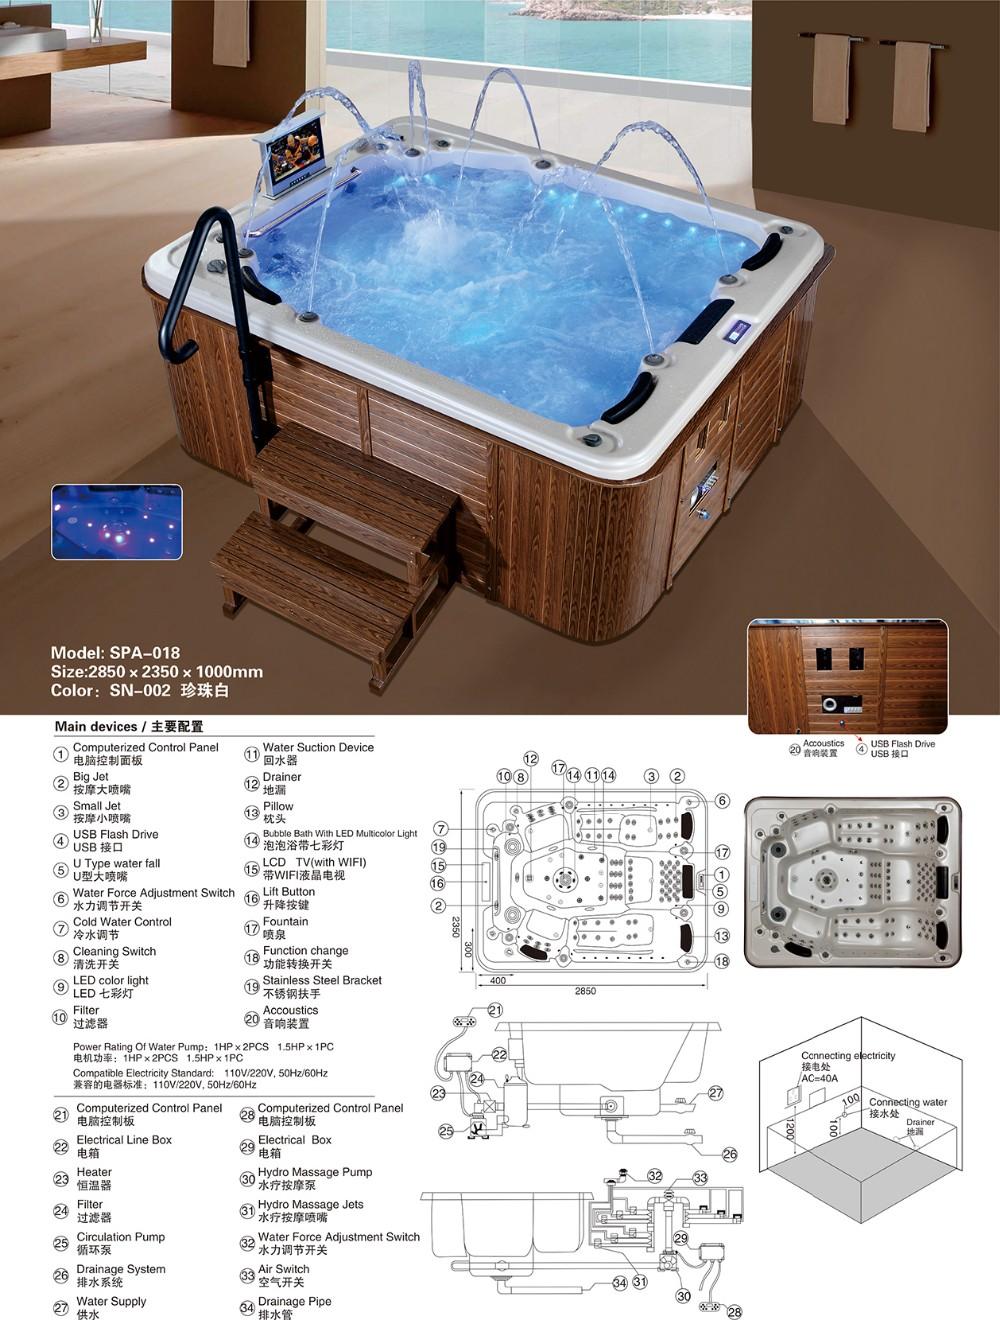 Spa-018 Luxury Tv Spa Tubs,Indoor Hot Tubs Sale 5 Person - Buy ...